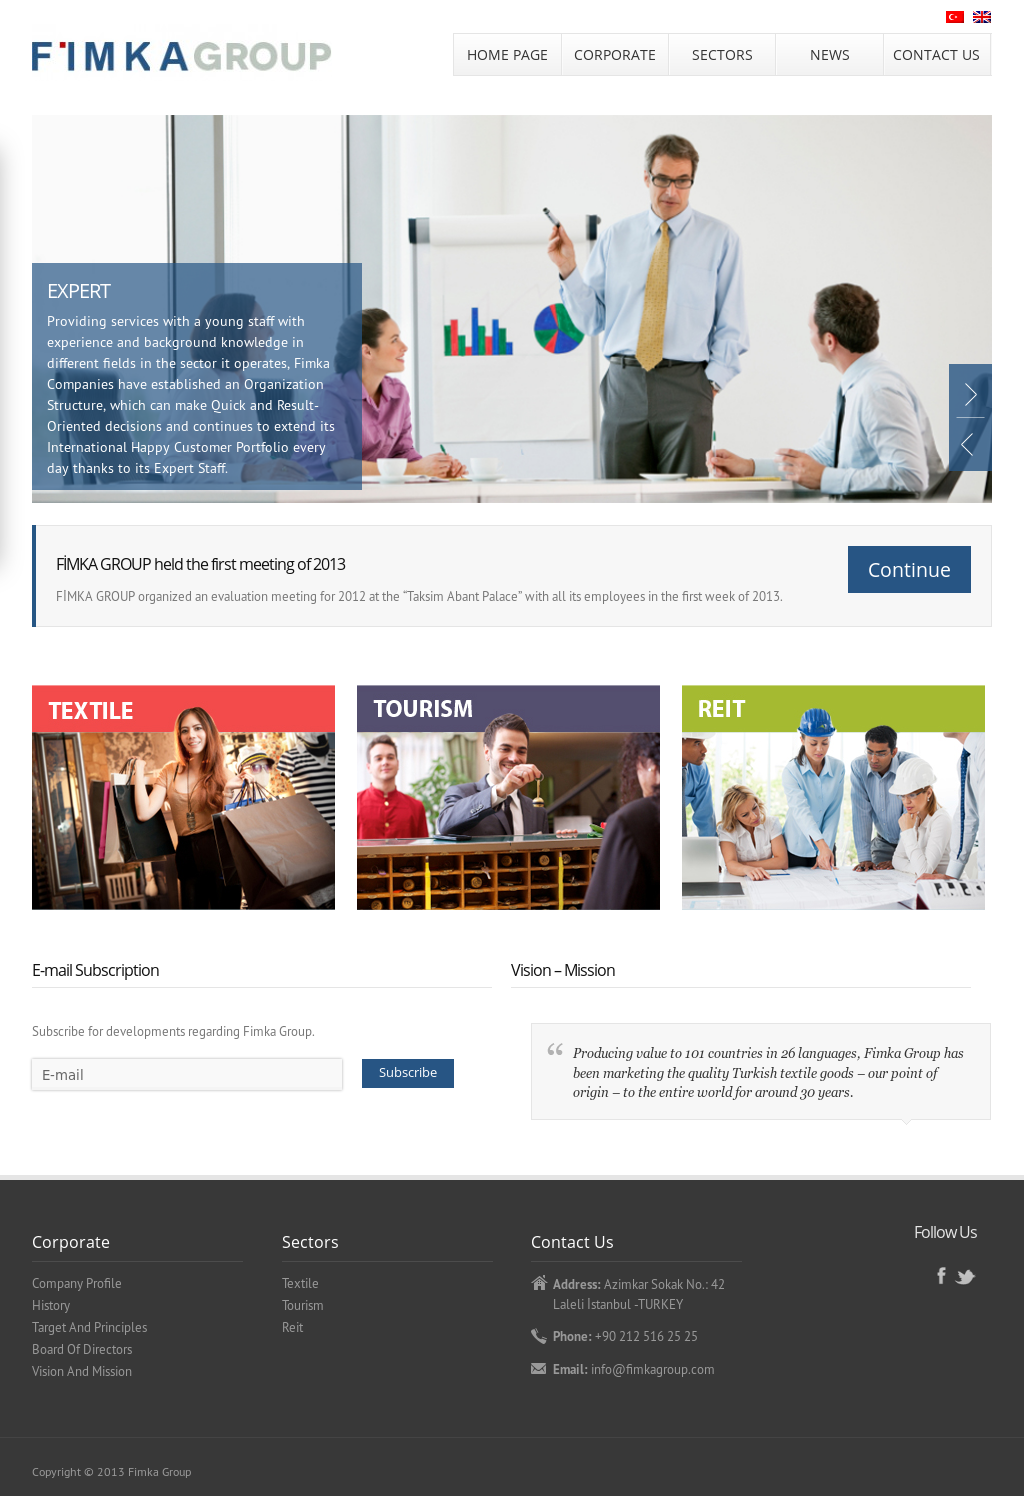 Fimka Group Competitors, Revenue and Employees - Owler Company Profile